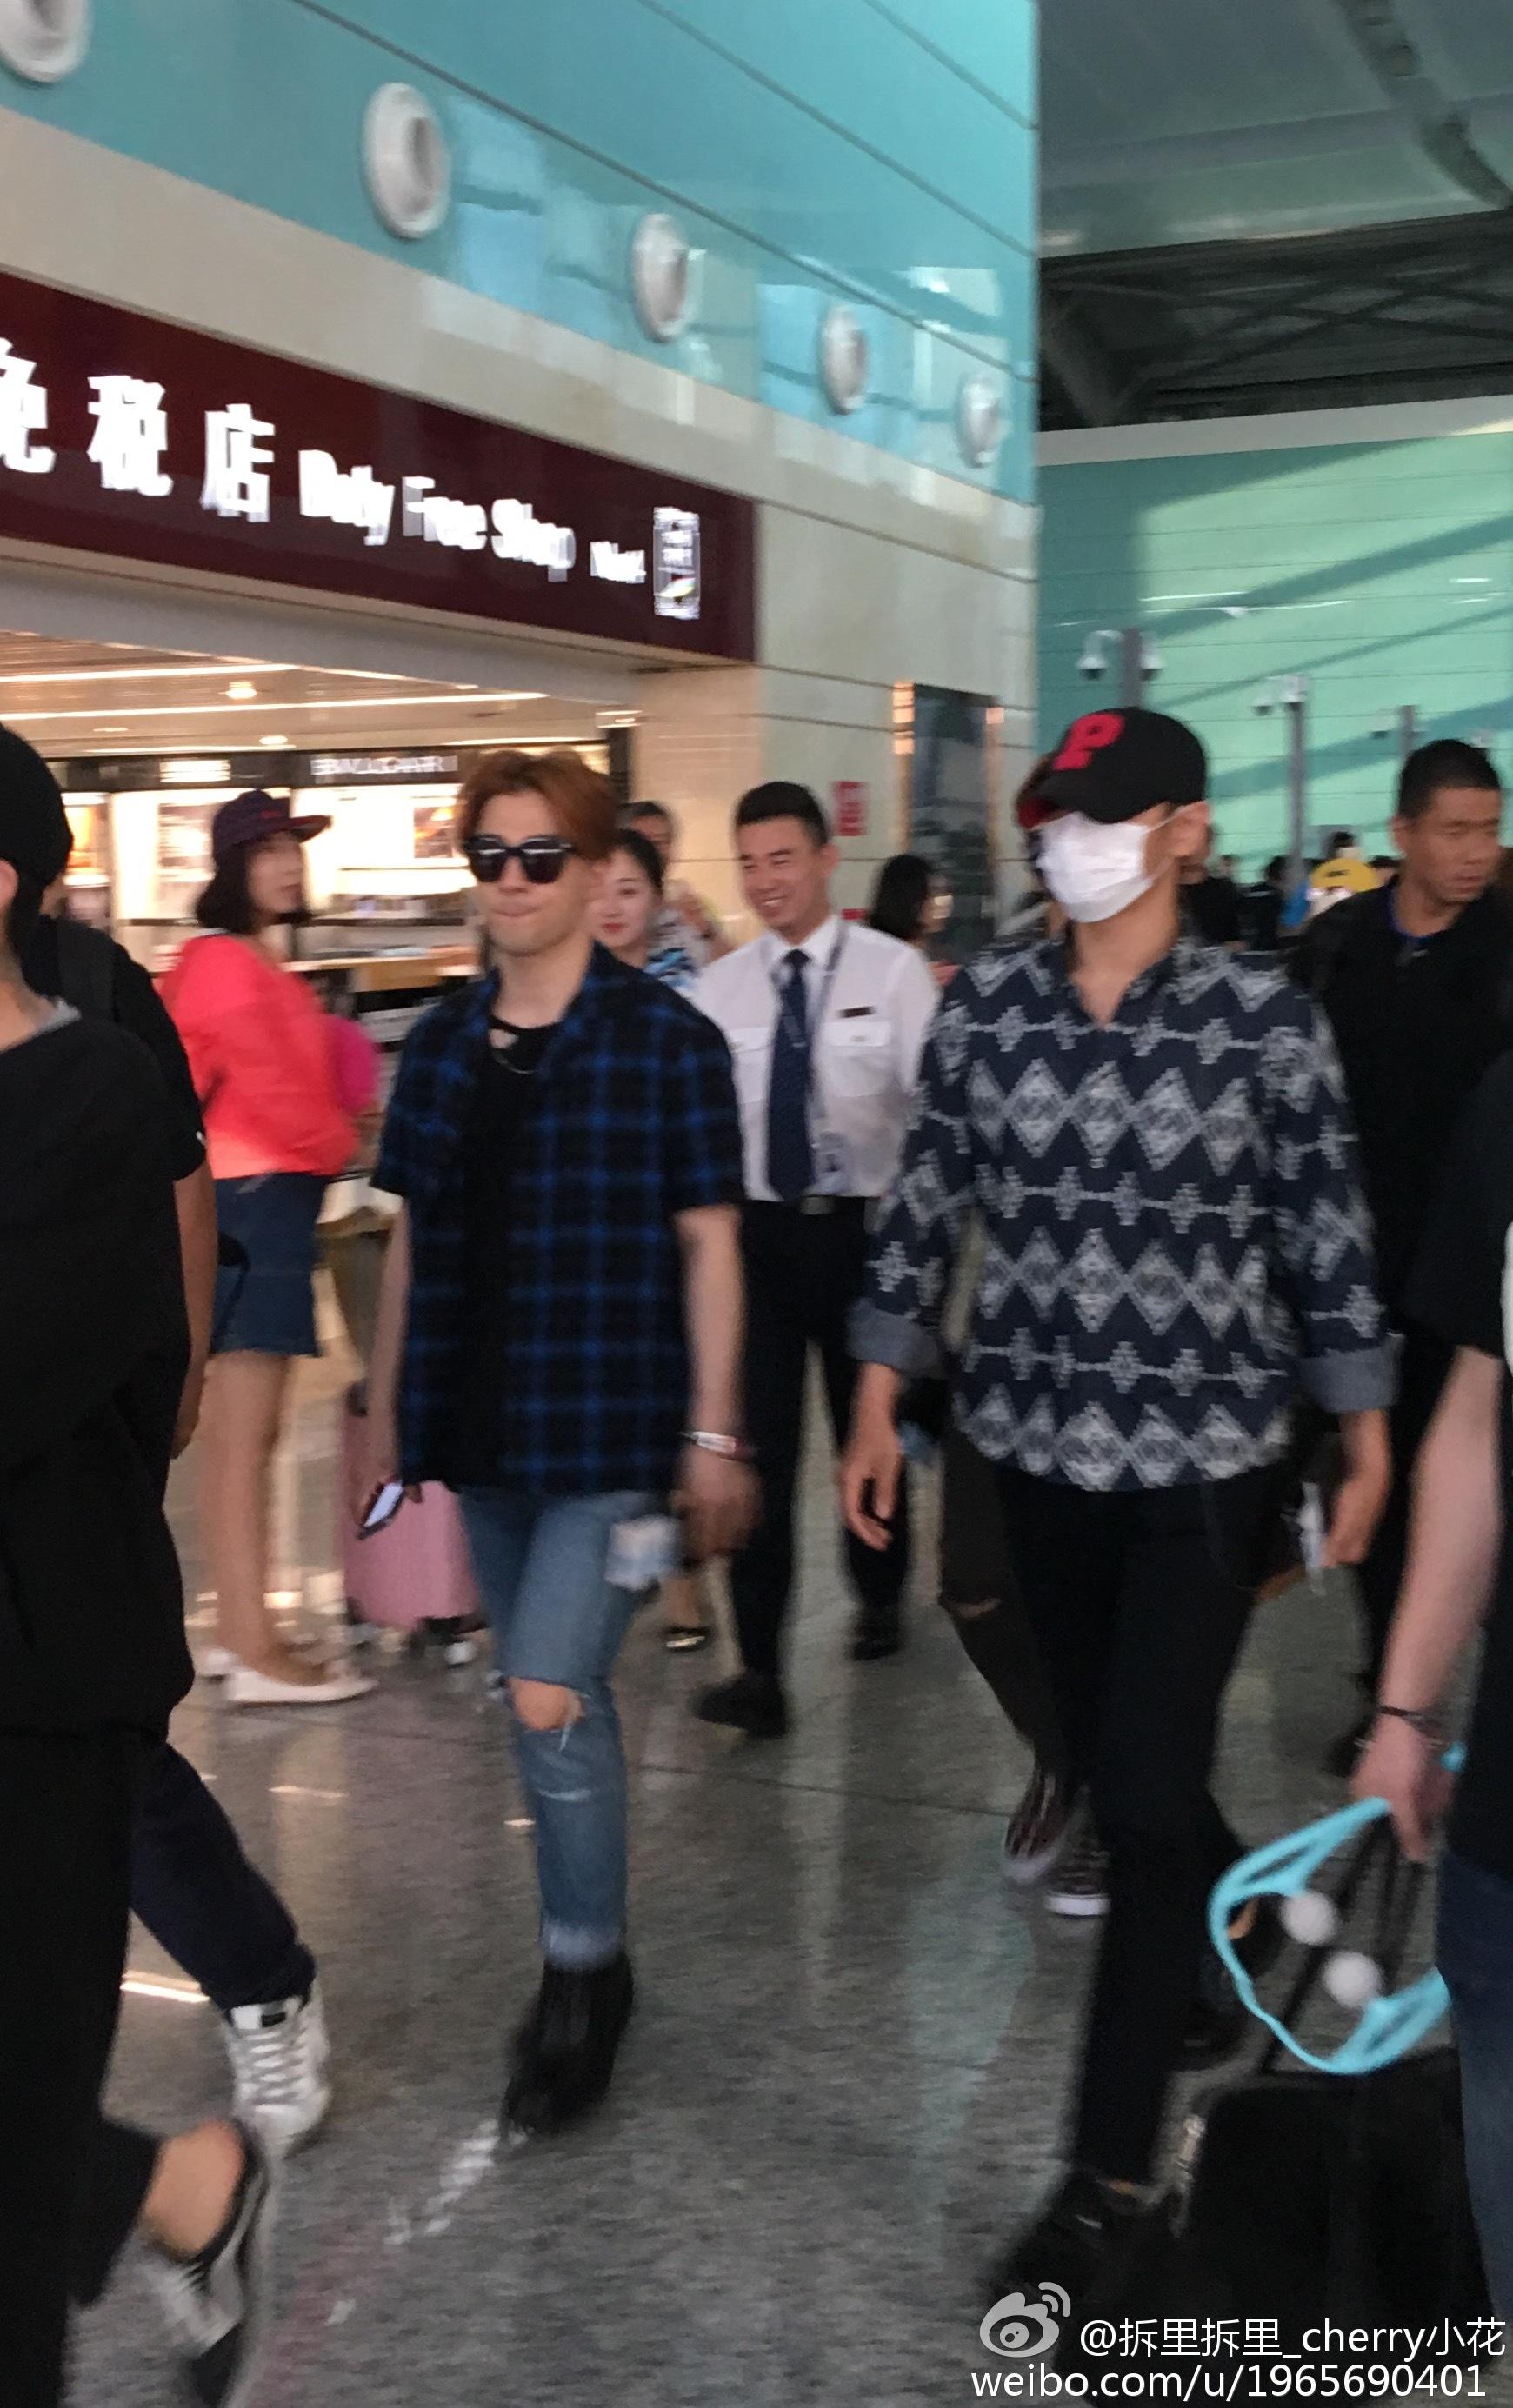 BIGBANG Departure Dalian 2016-06-26 (4)